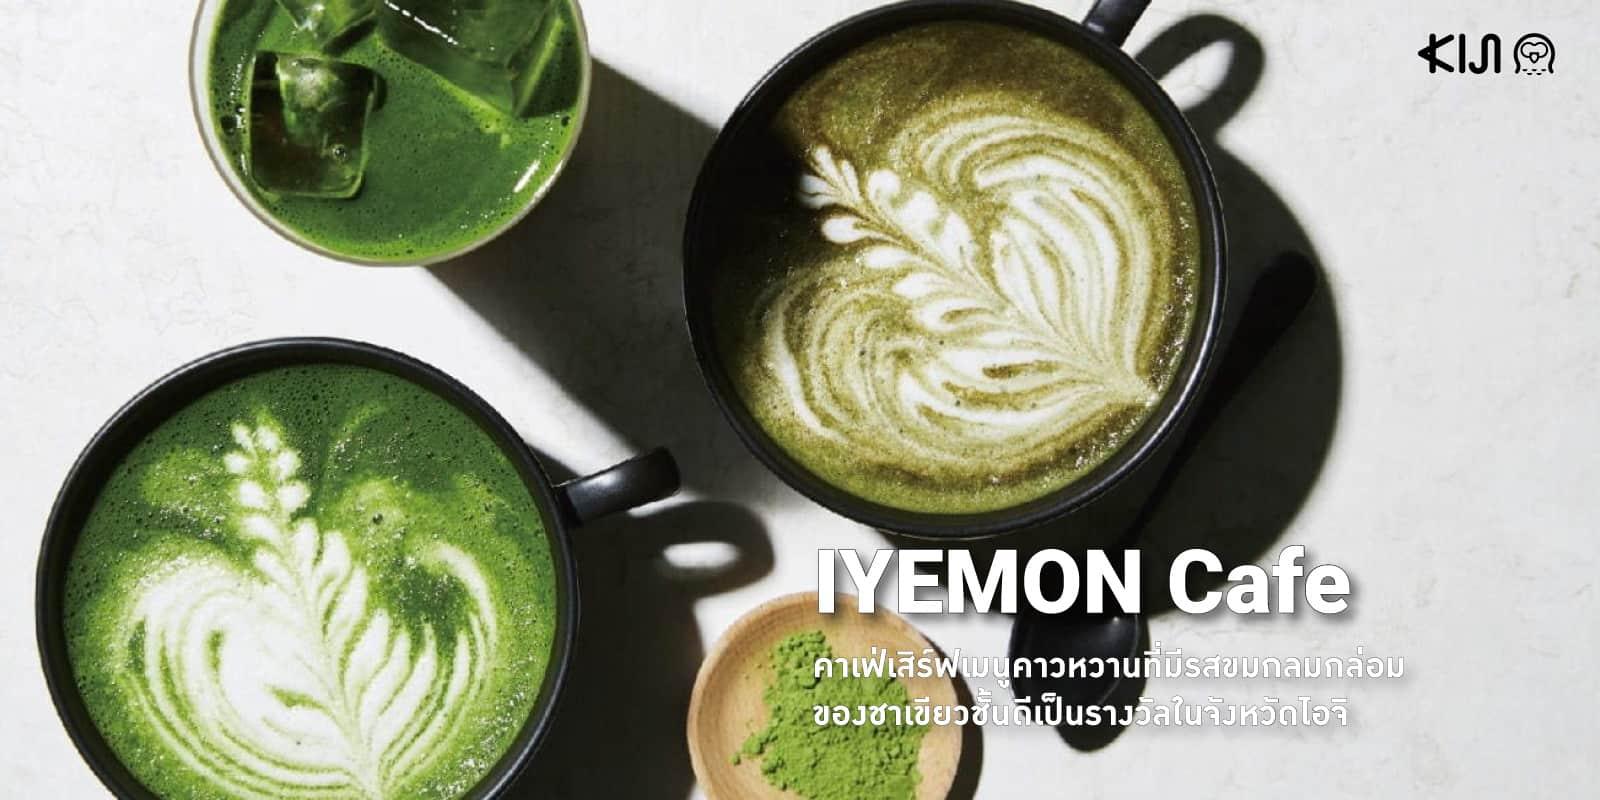 IYEMON Cafe จังหวัด ไอจิ